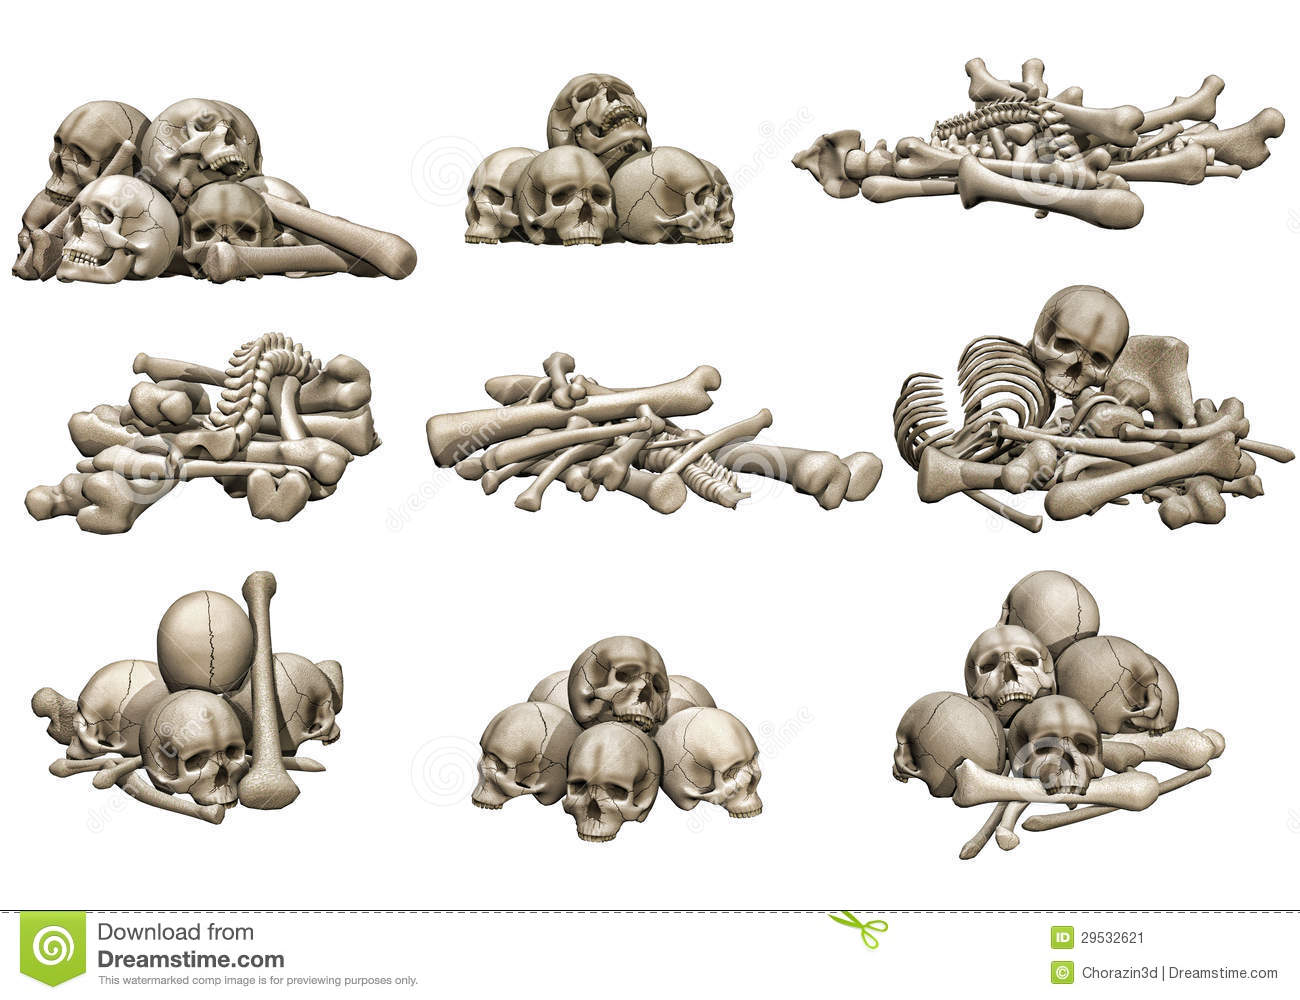 Bones clipart pile bone Pile Of Of Download Bones